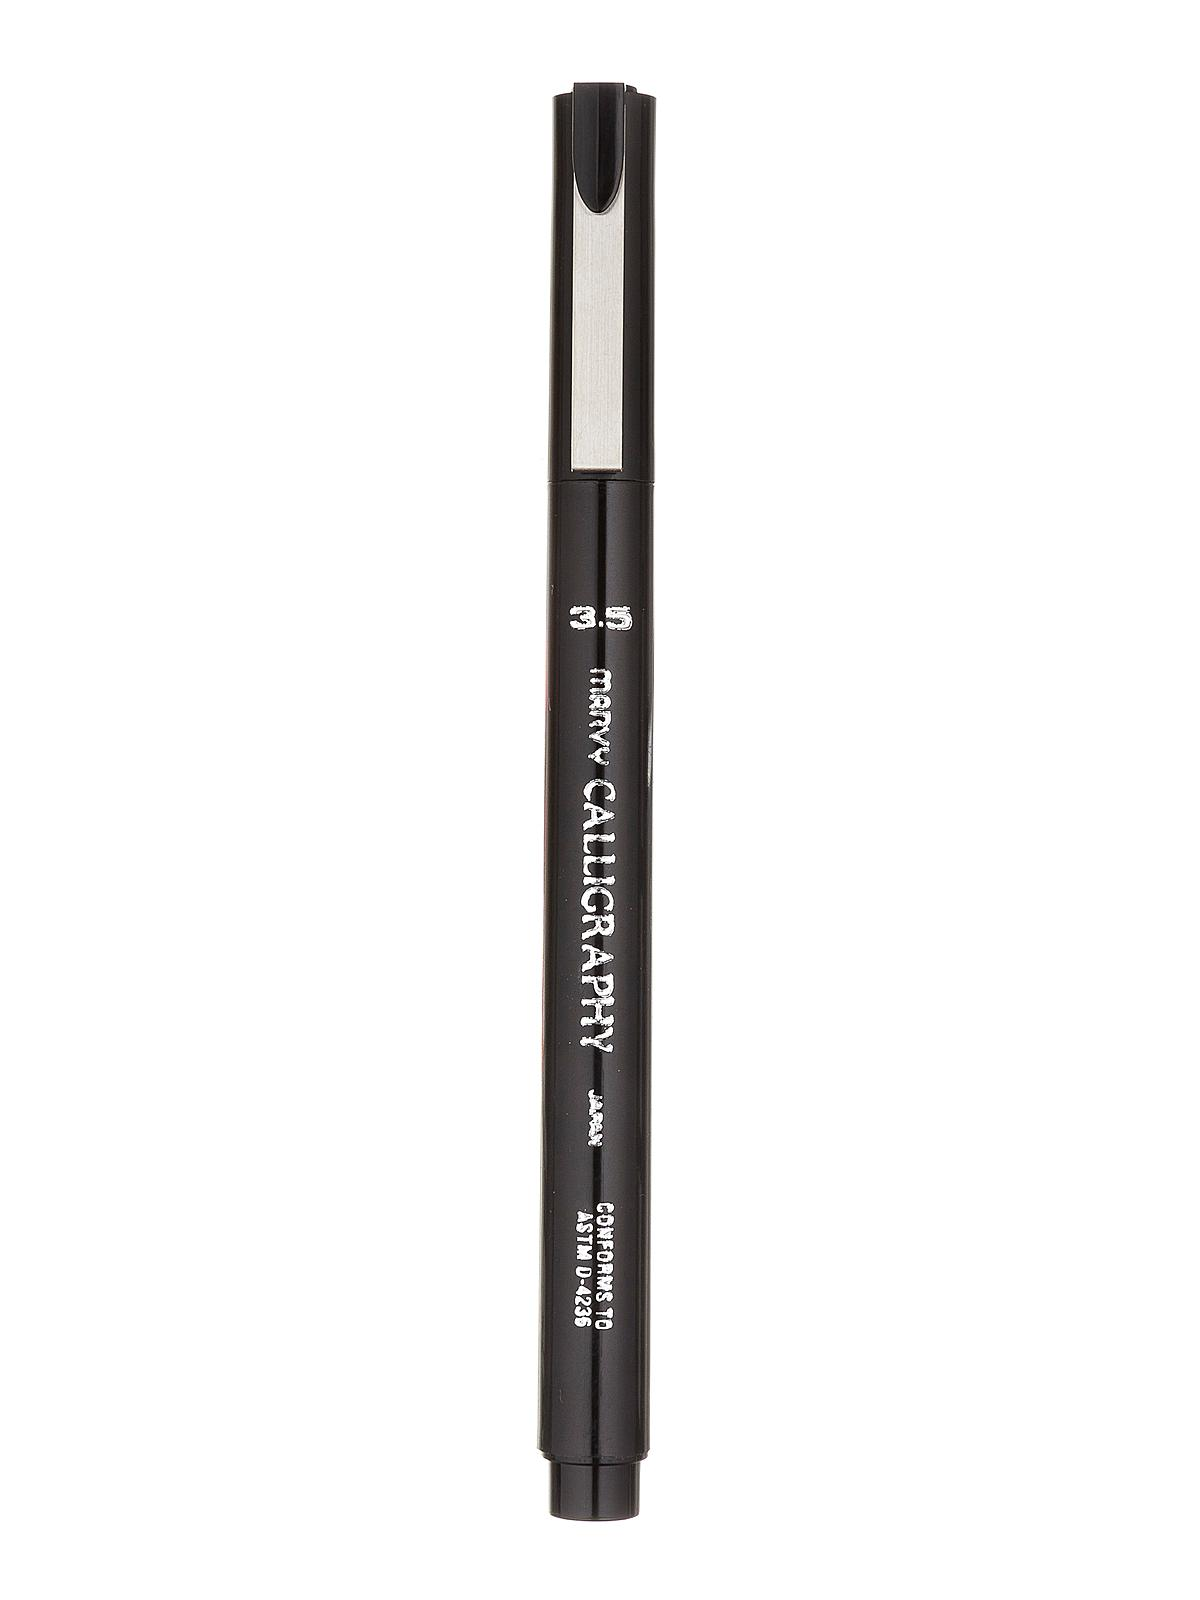 Medium Point Black 3.5mm Uchida Calligraphy Marker 6000MS-1